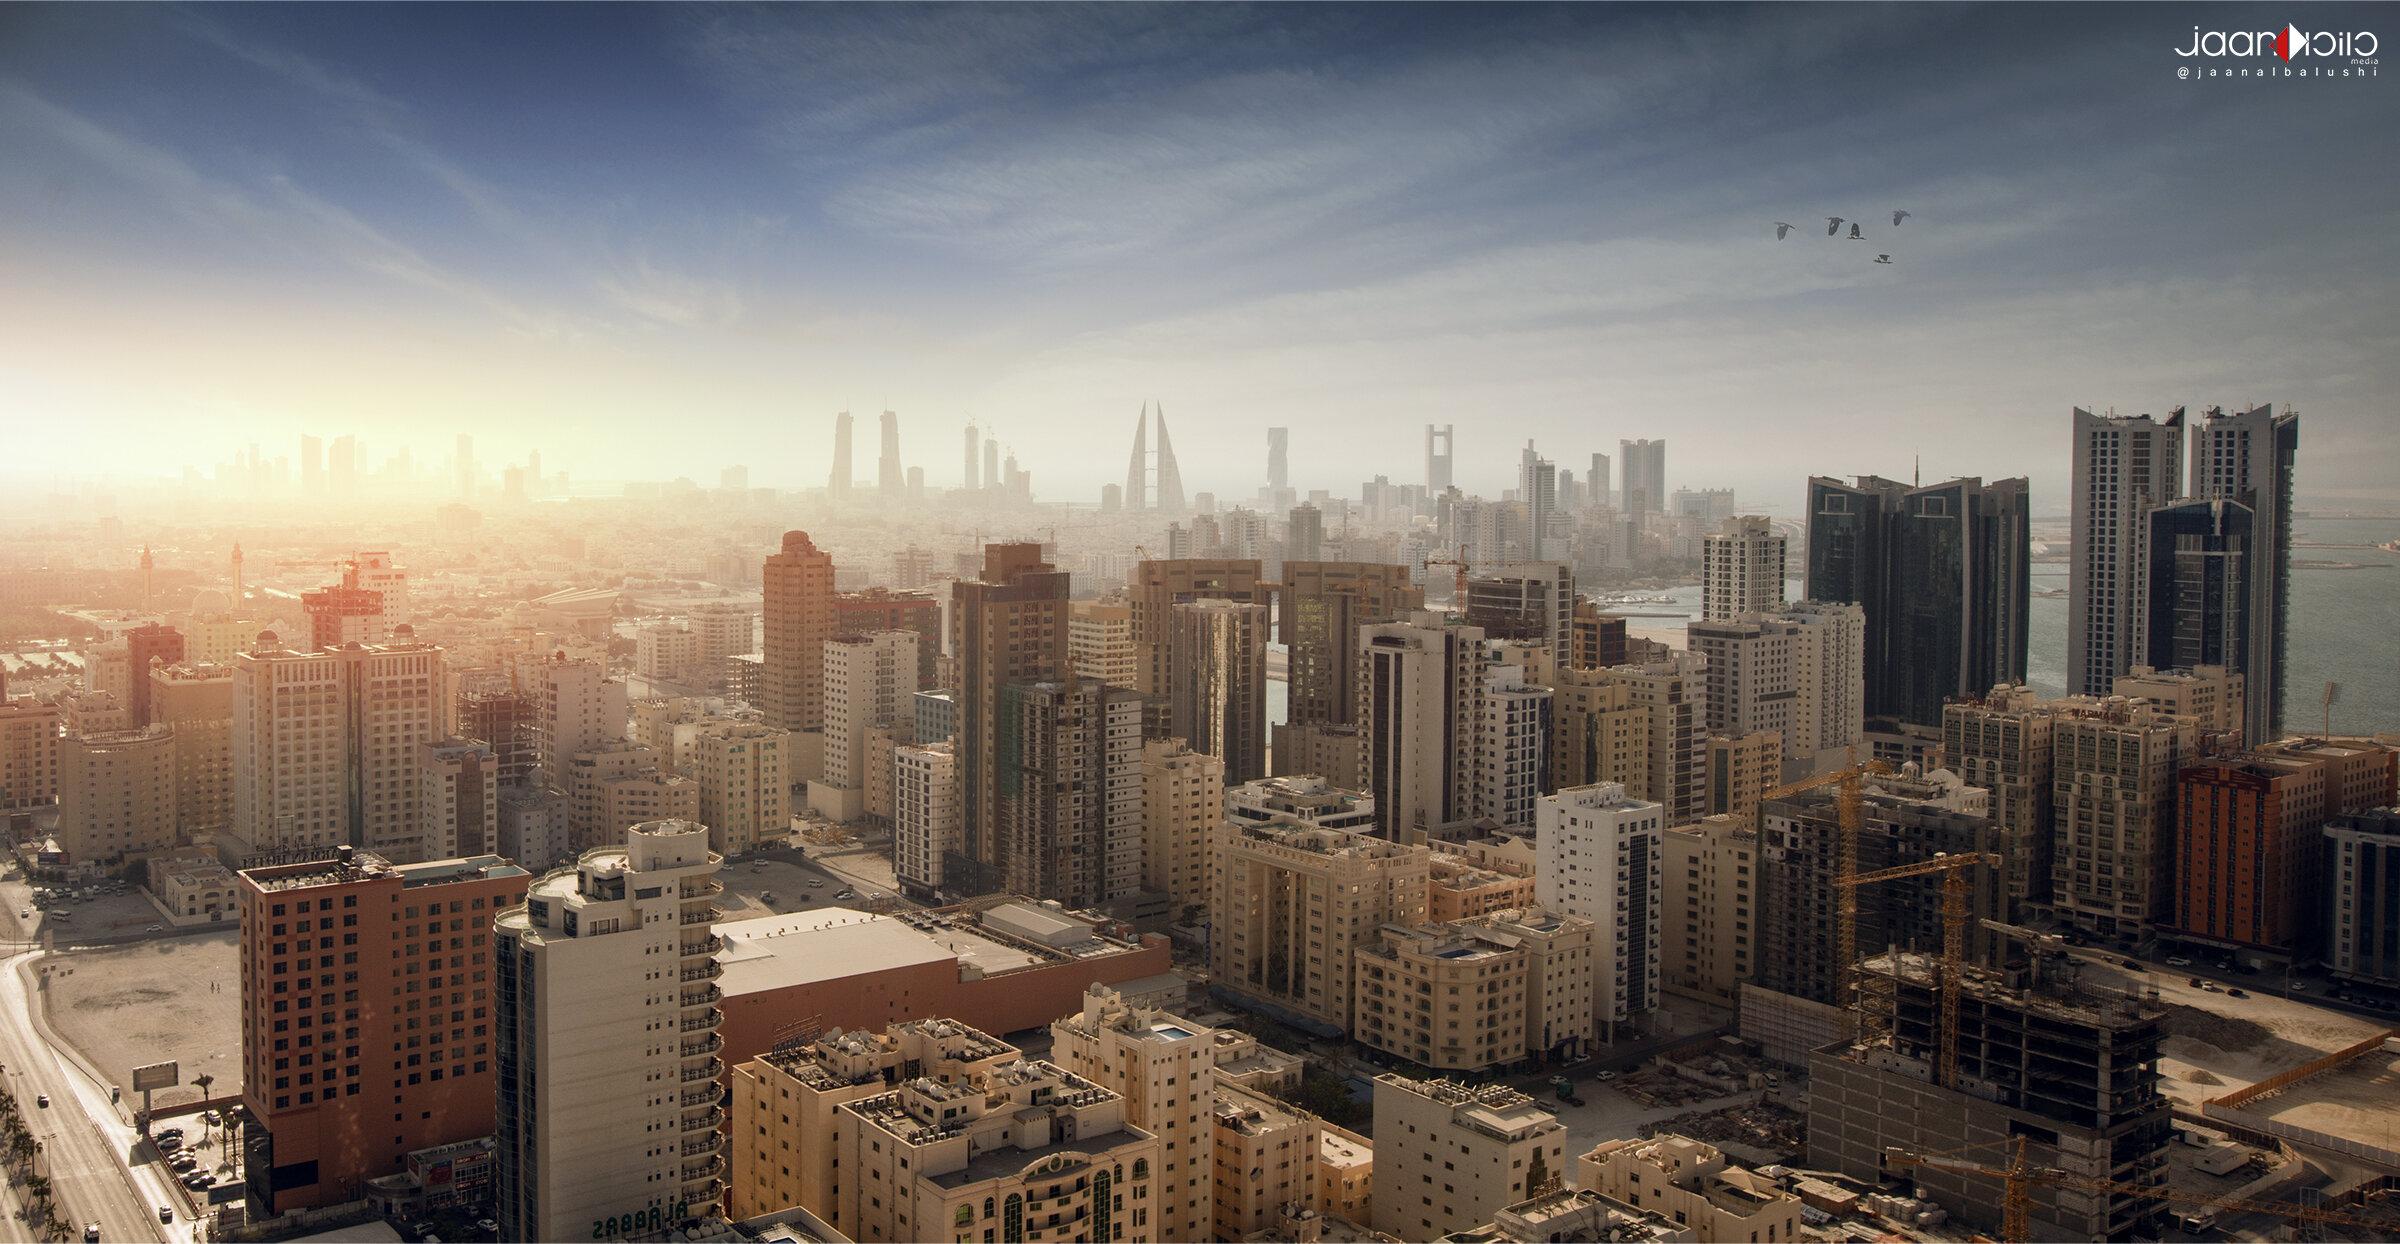 Bahrain Jufair copy.jpg